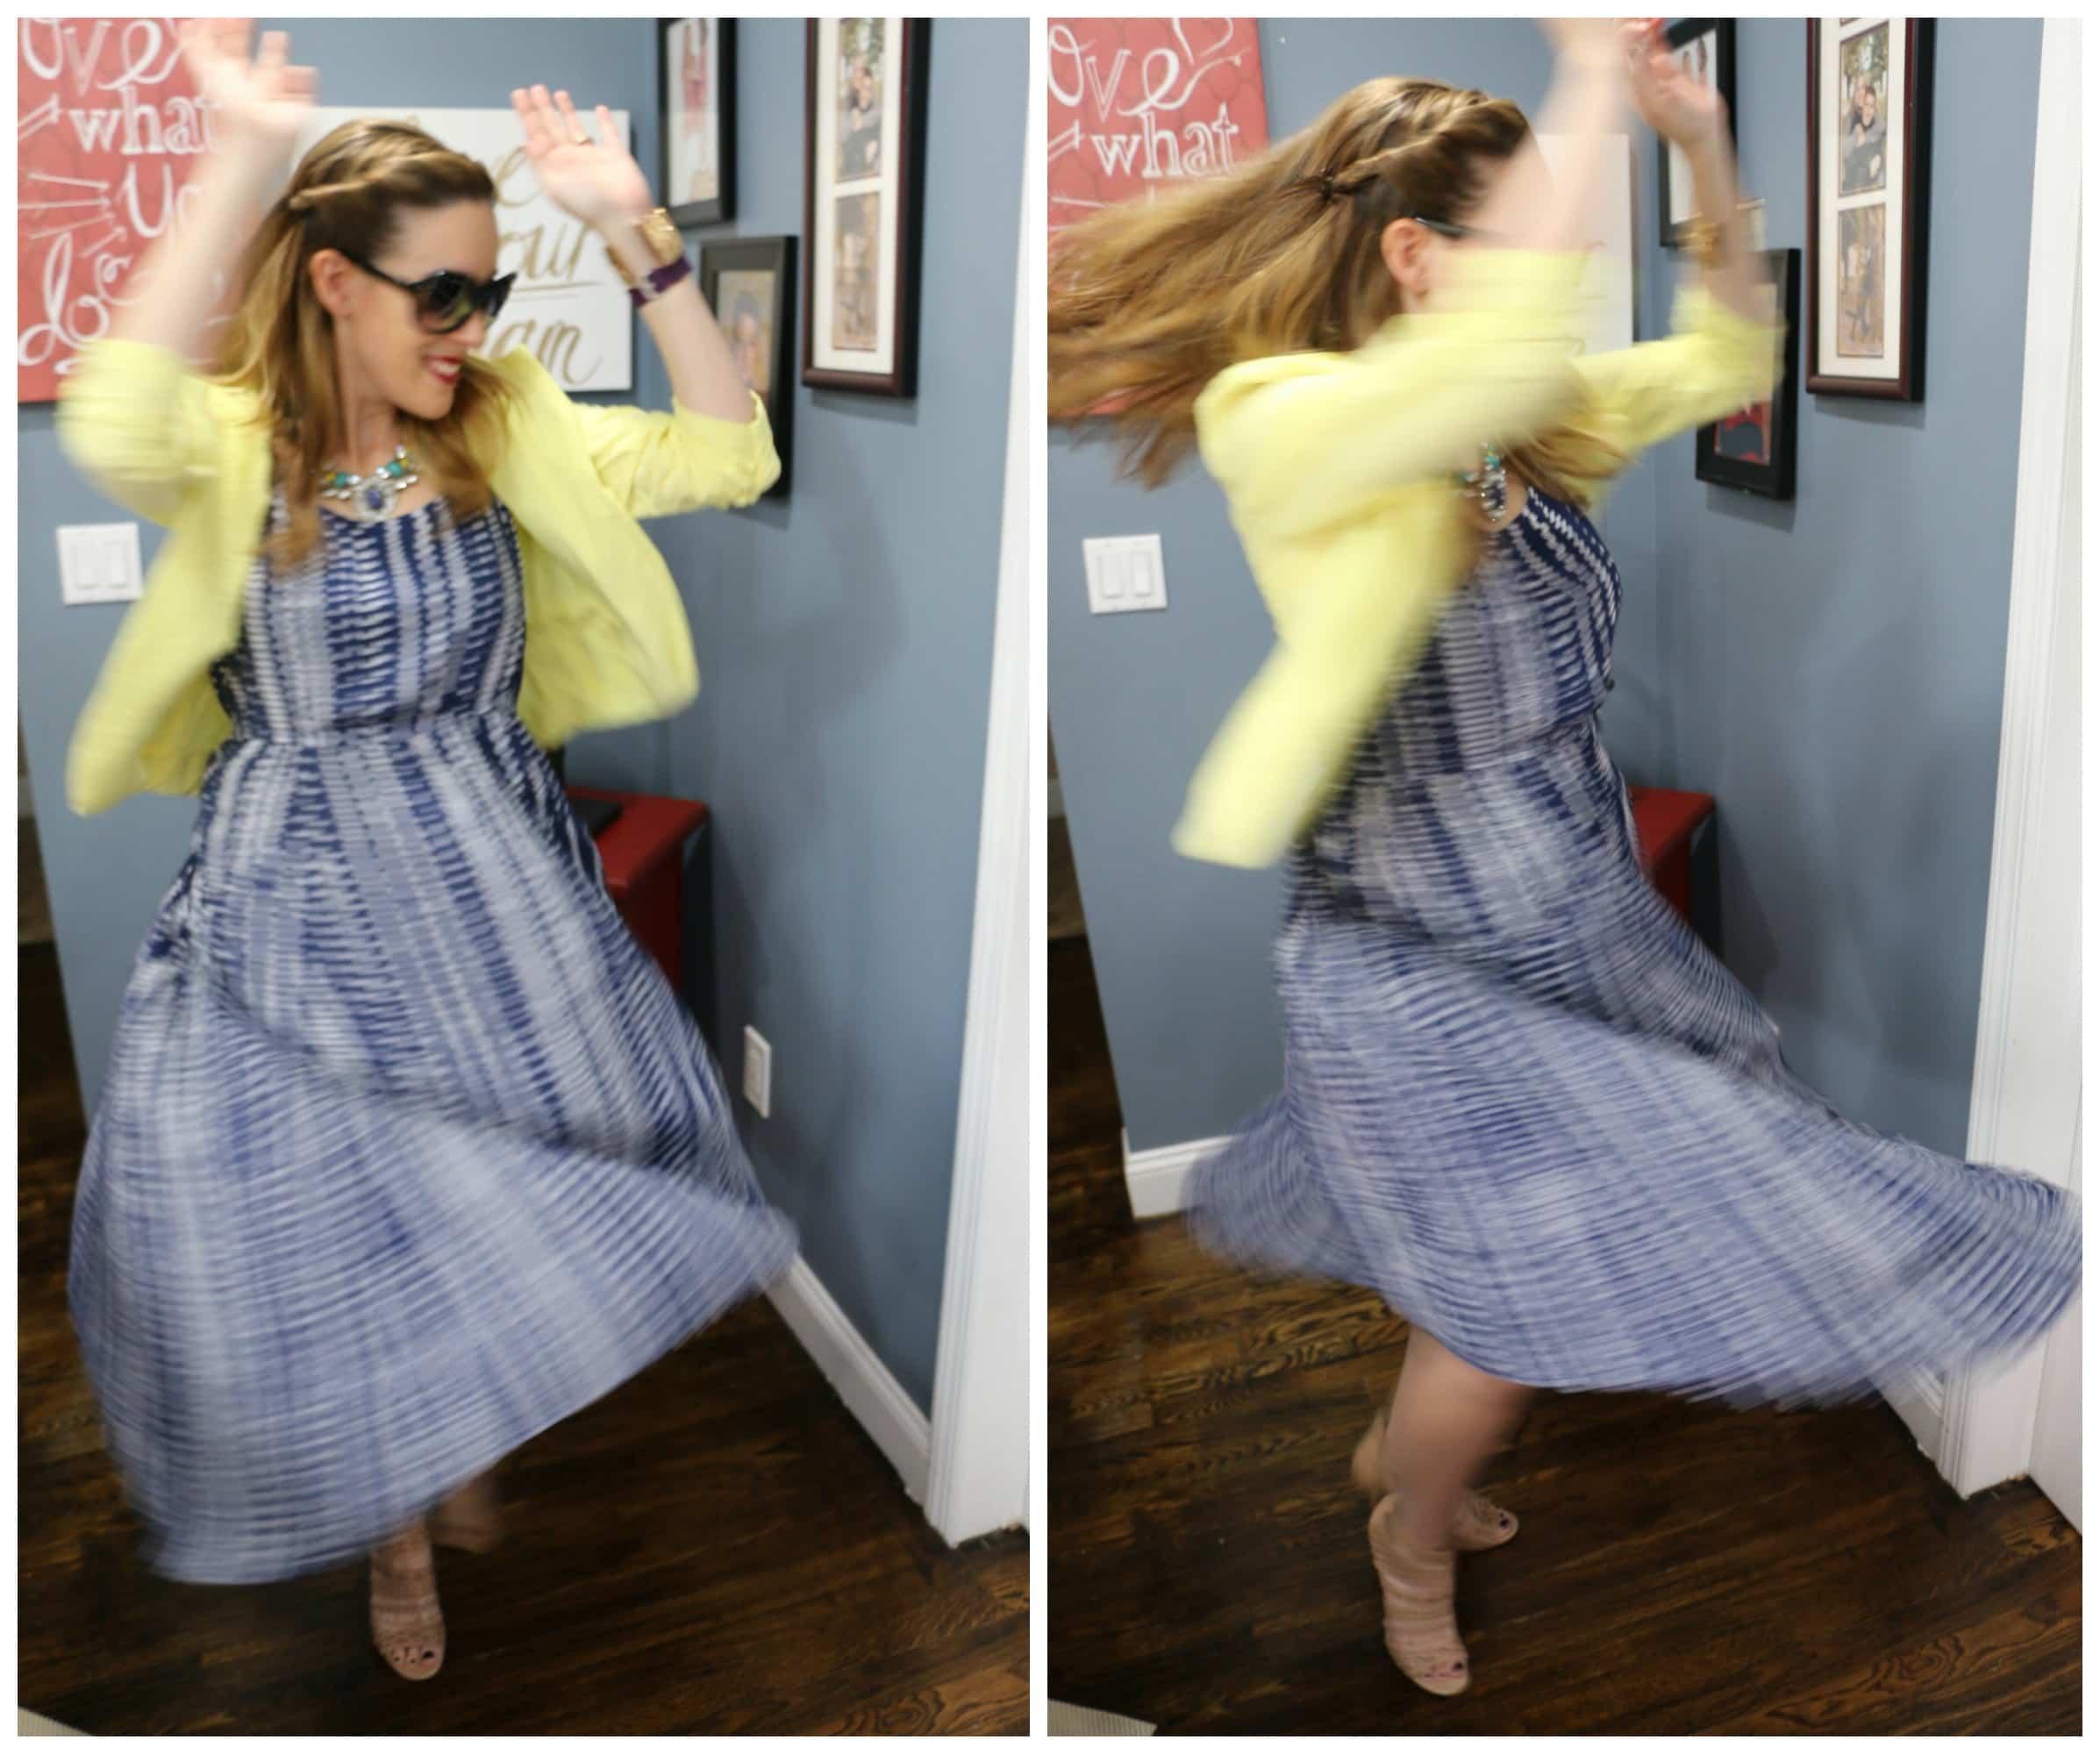 What She Wore: Cabi Margherita Dress